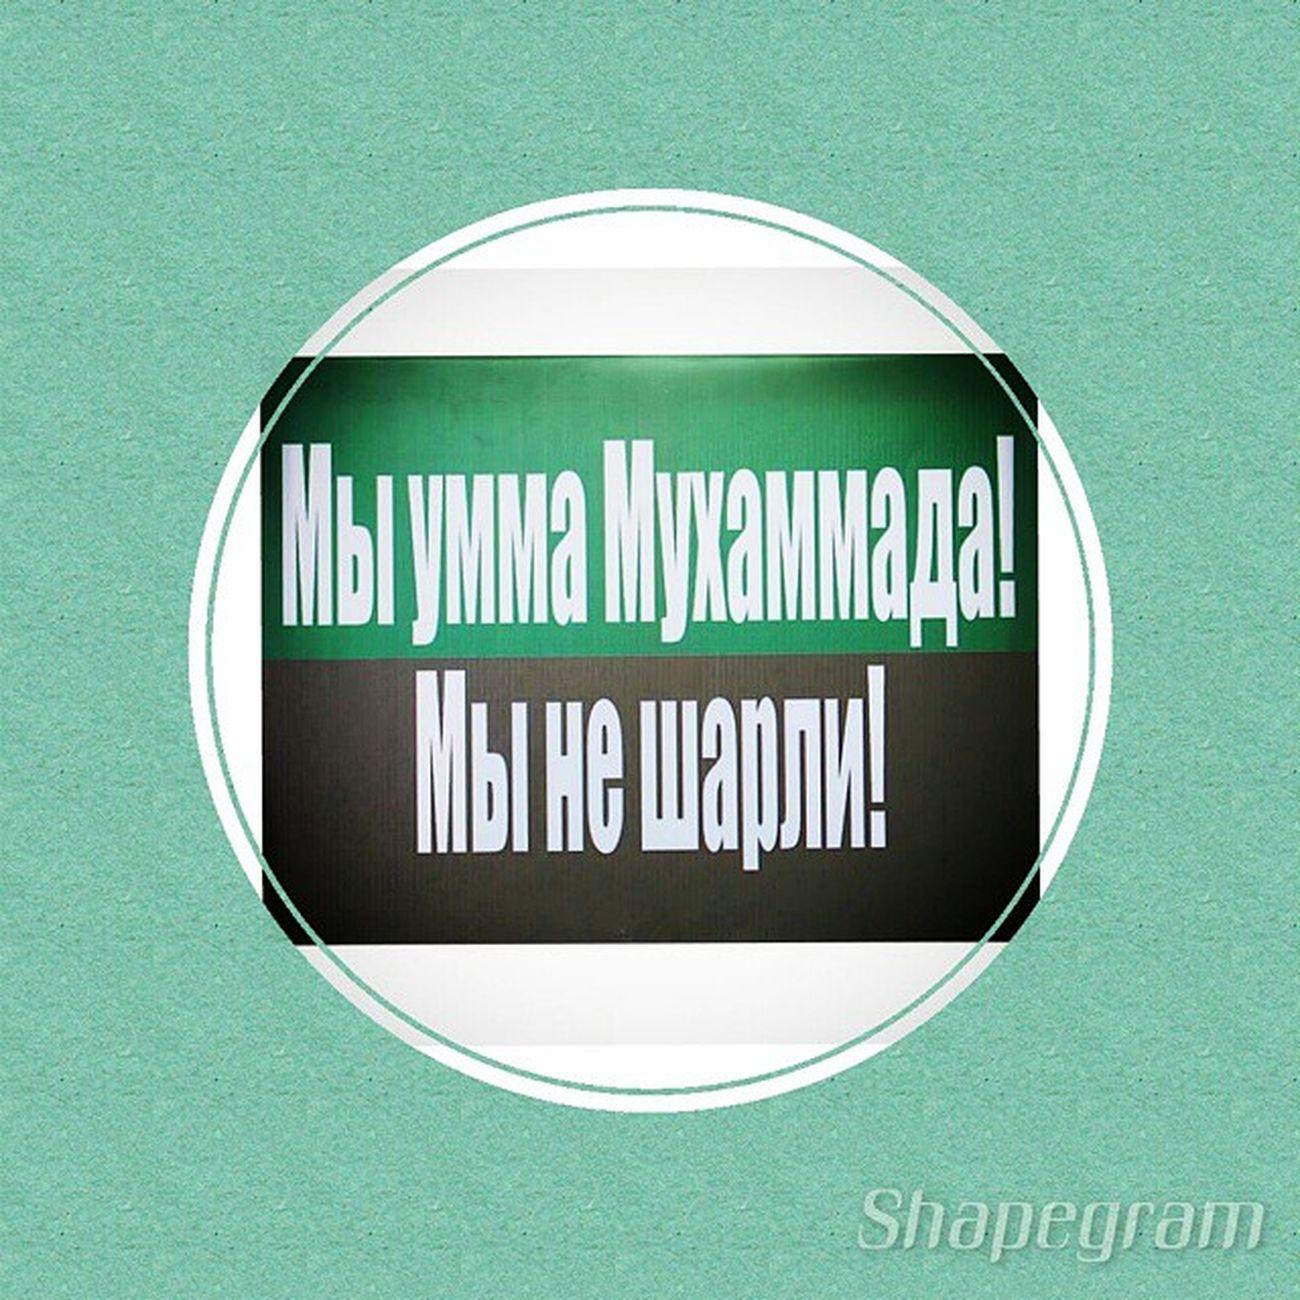 (Made with @shapegram_rc) Shapegram